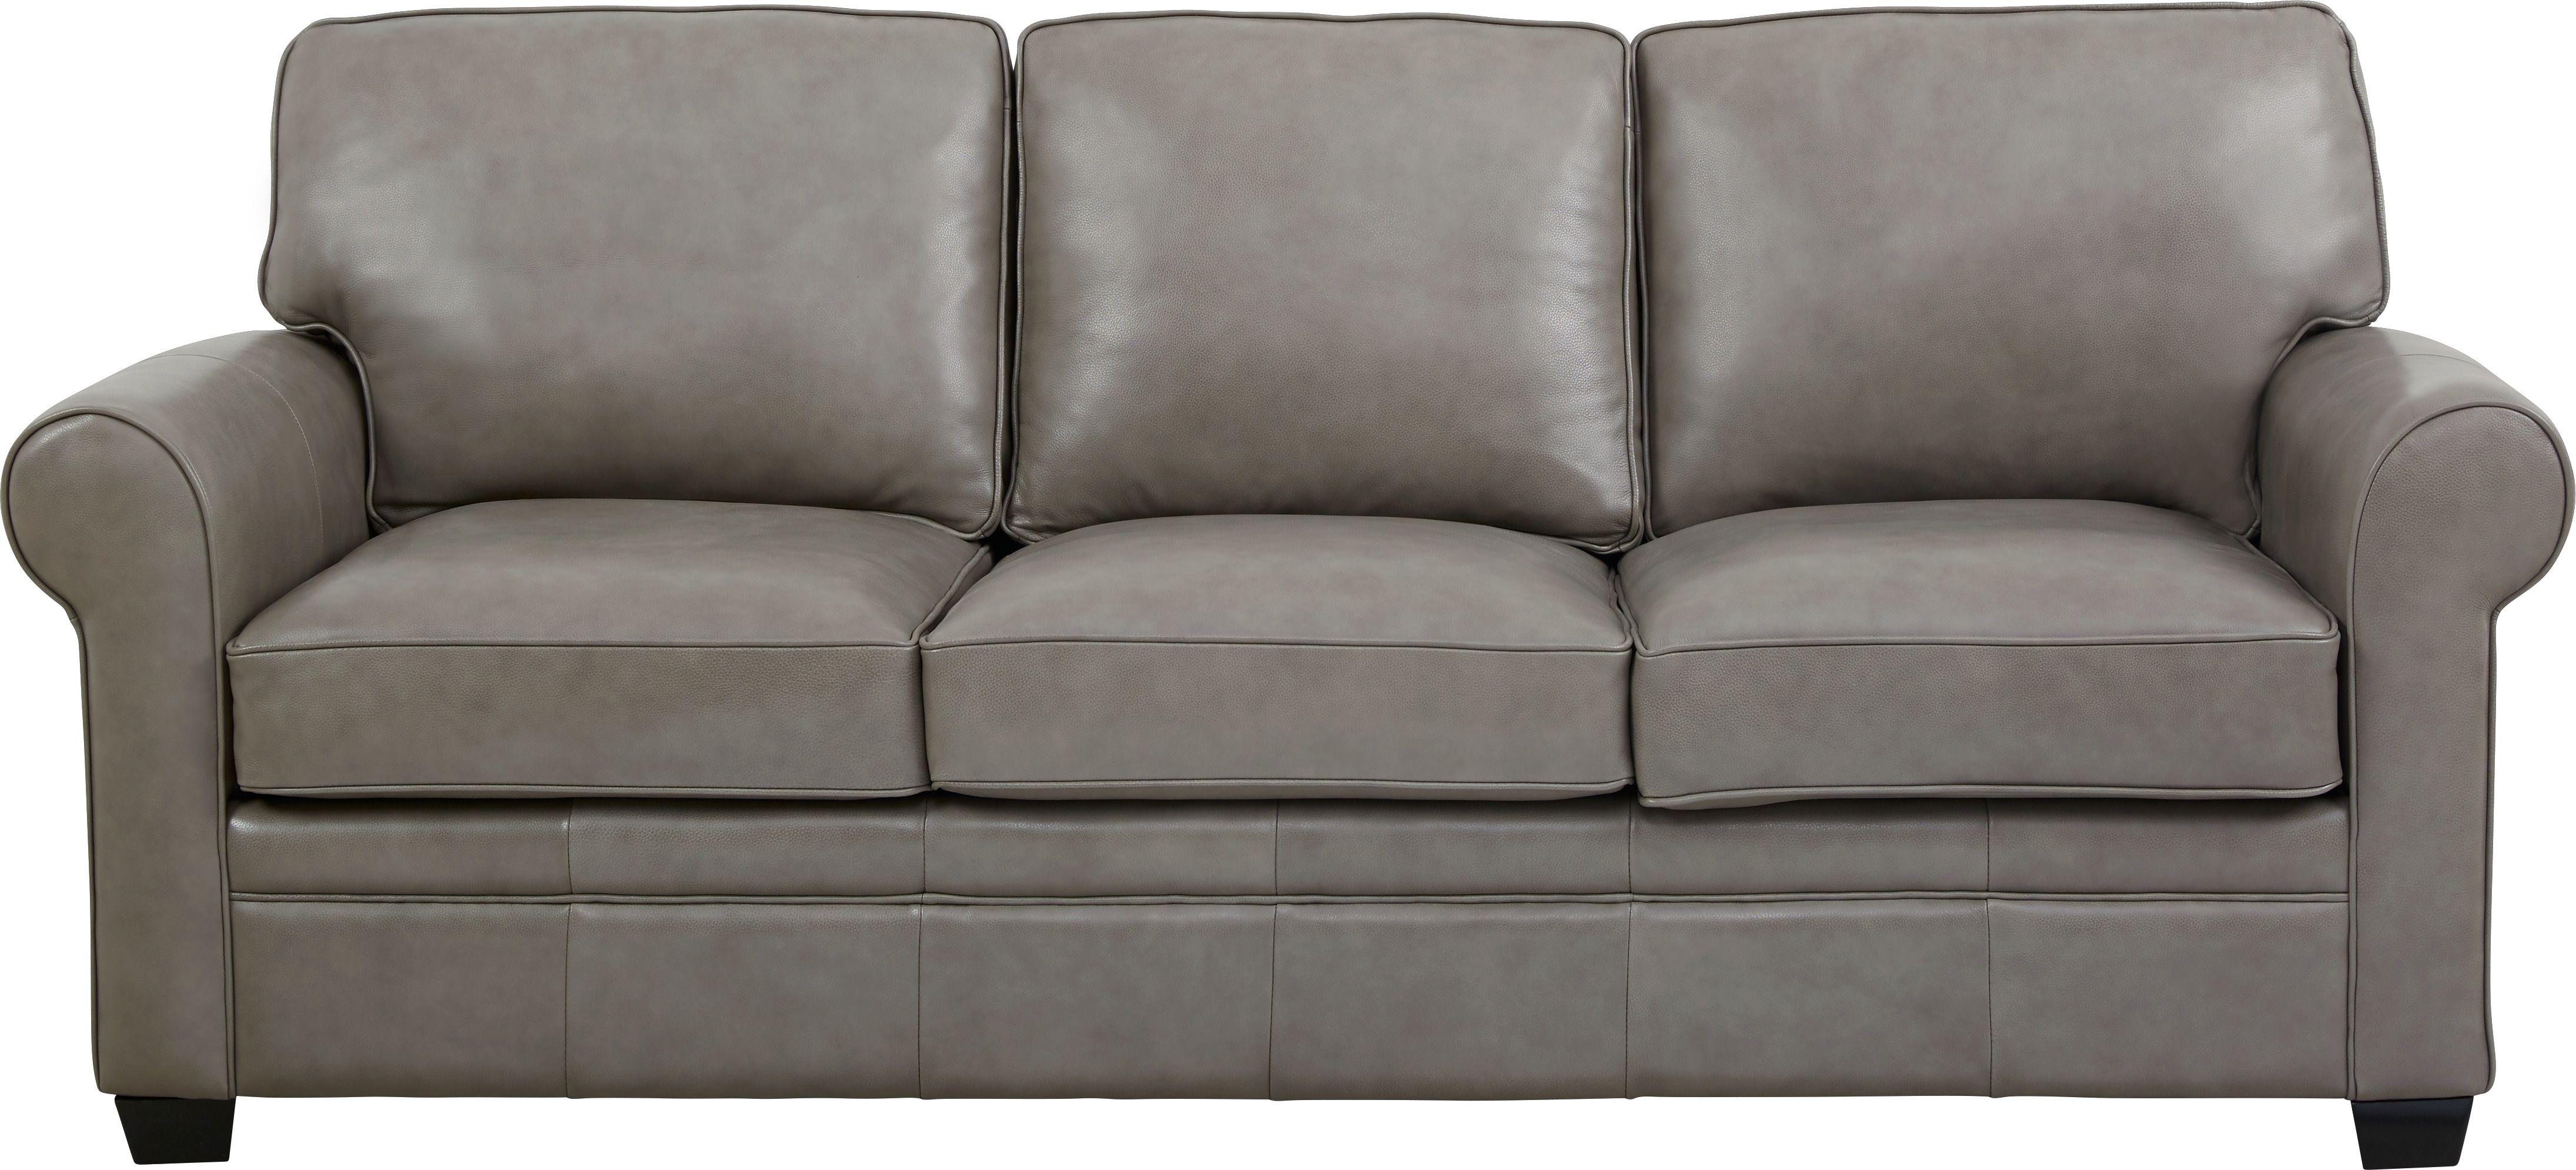 Nikola Place Gray Leather Sleeper Grey Leather Sofa Sofa Leather Sofa